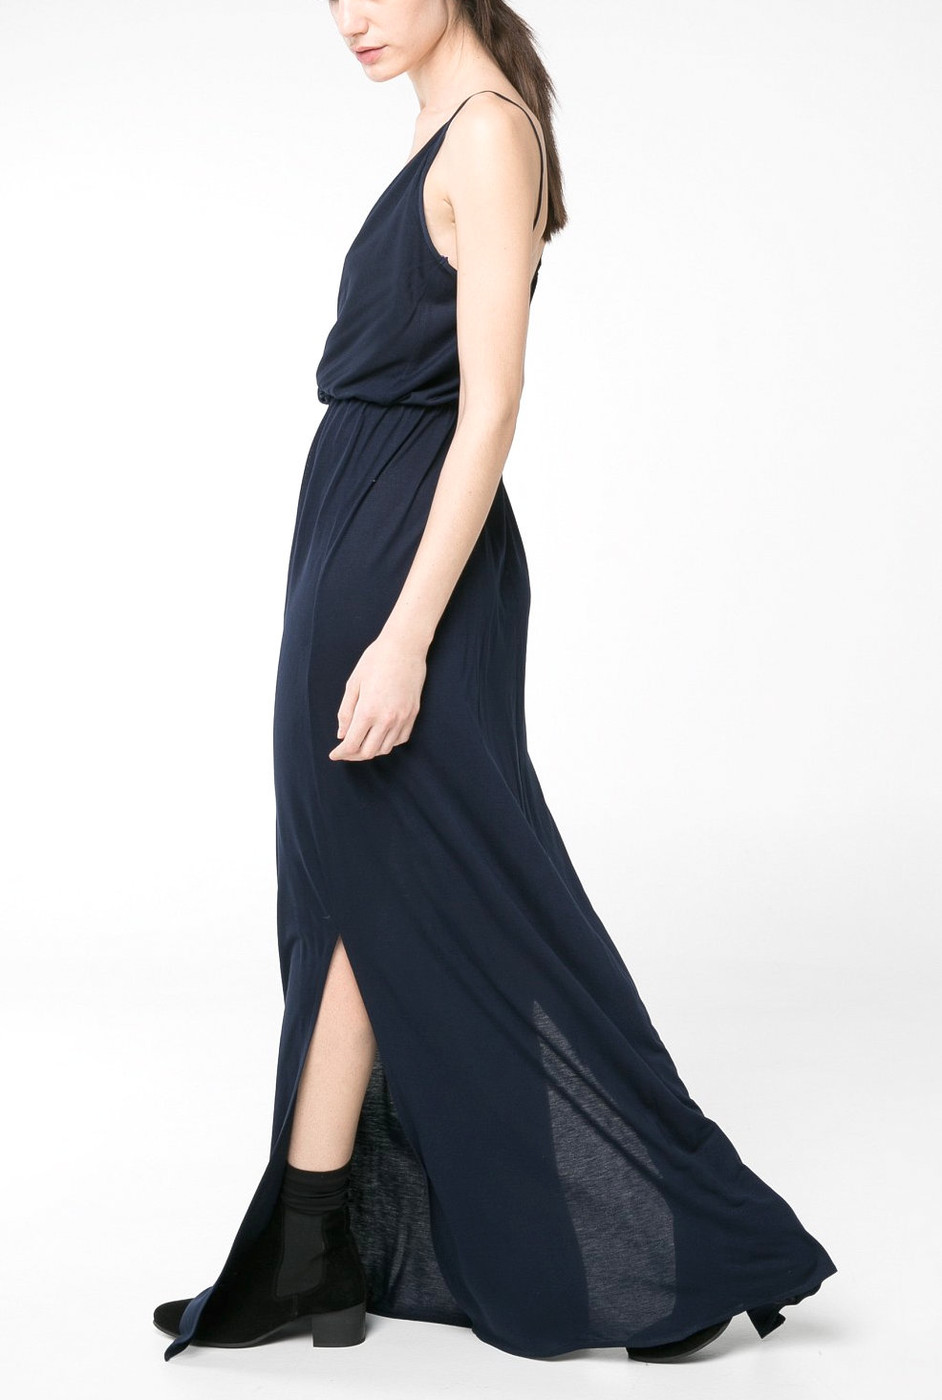 MANGO - NEW - Side-slit wrap dress - Mozilla Firefox 4.4.2014 113139-001.jpg